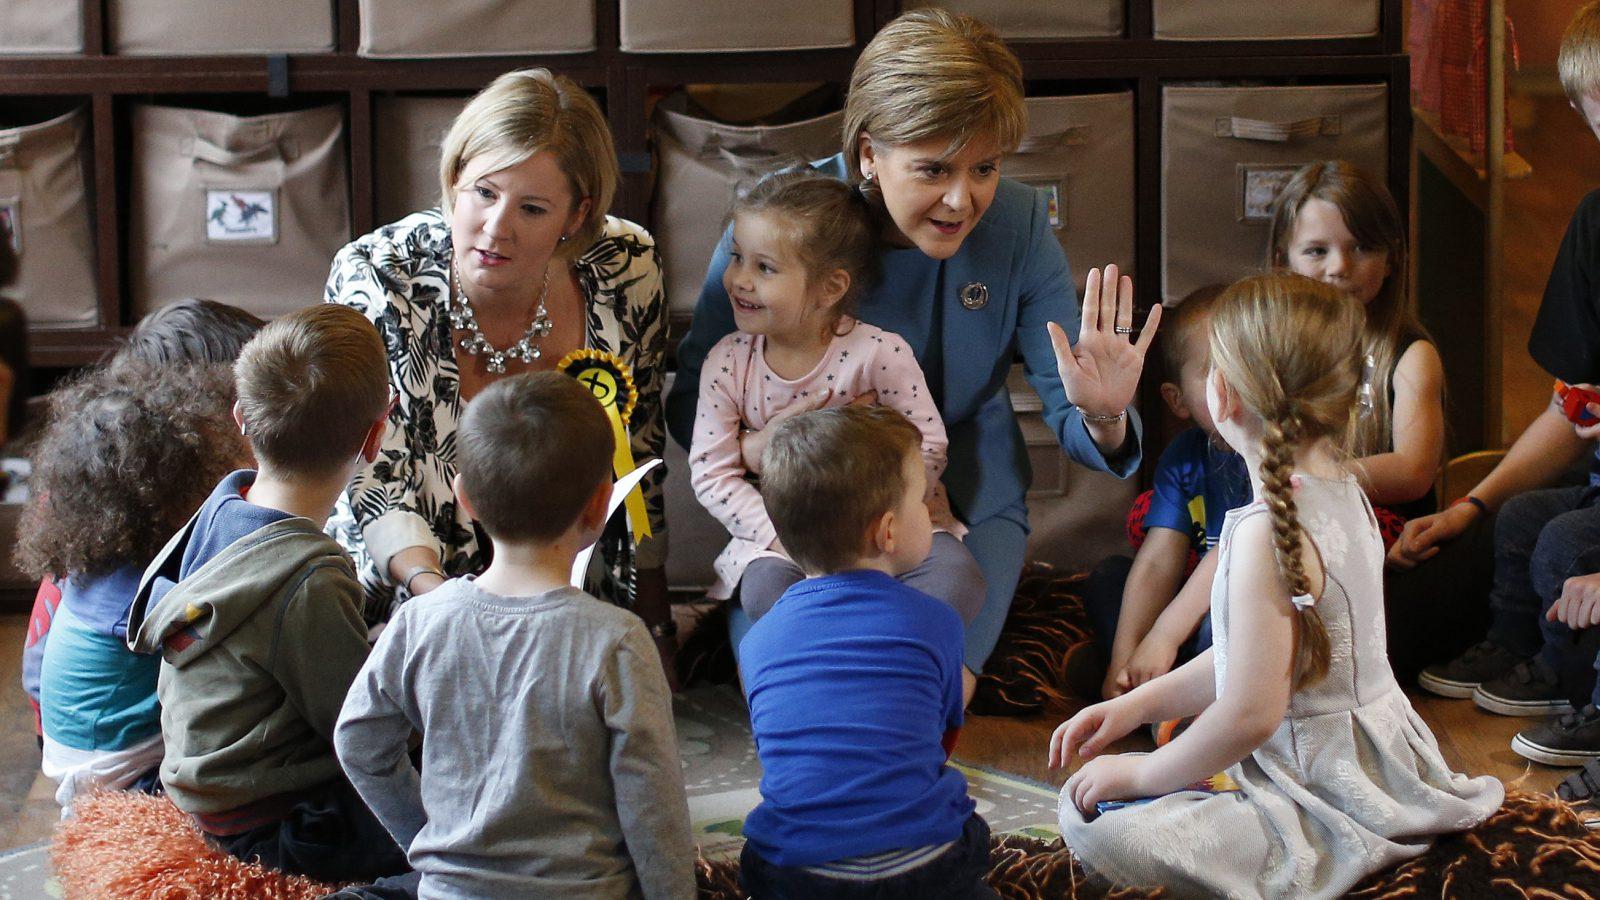 Nicola Sturgeon, leader of the Scottish National Party, gestures to children.